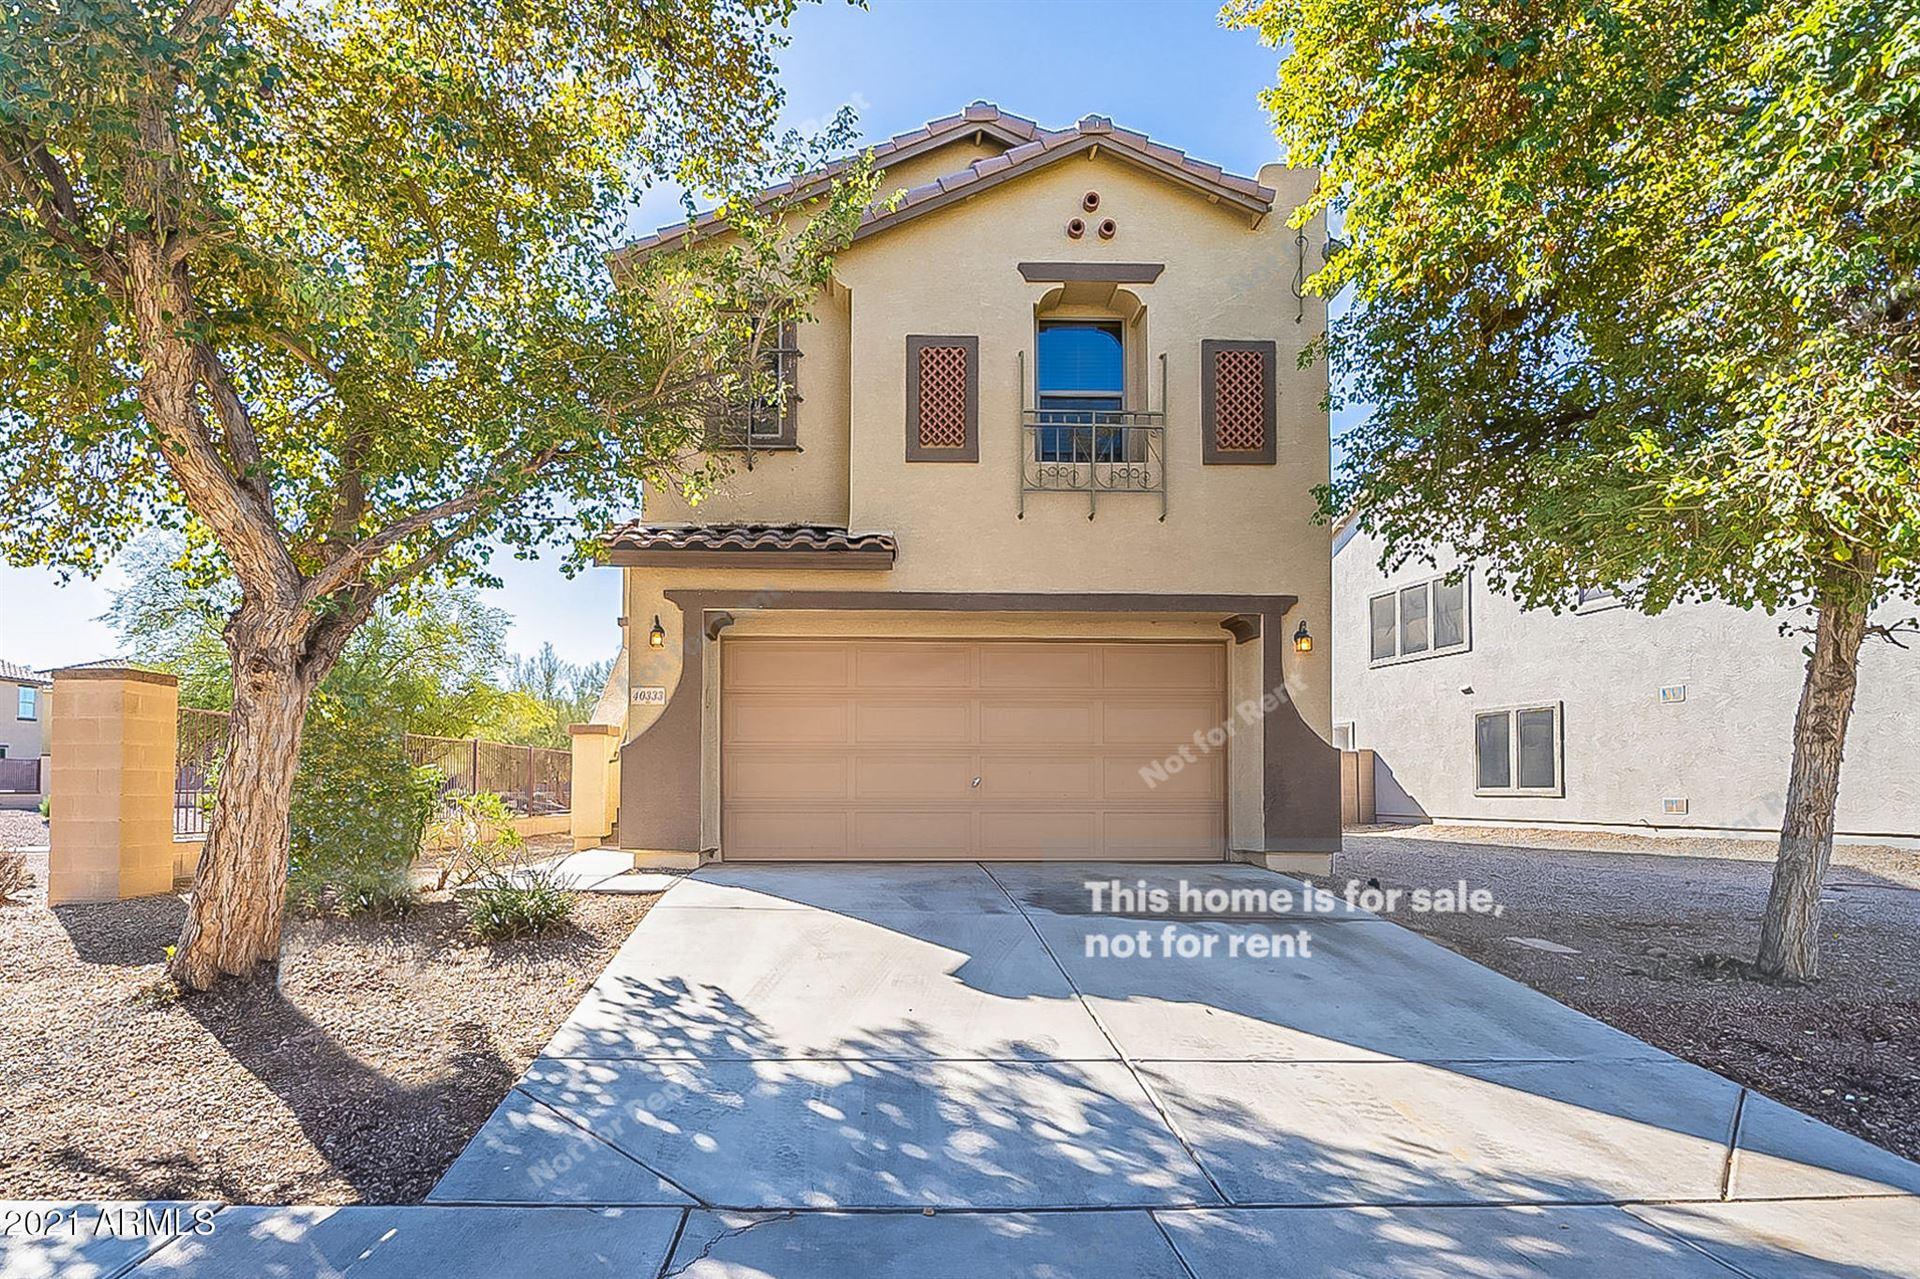 Photo for 40333 W MOLLY Lane, Maricopa, AZ 85138 (MLS # 6180514)